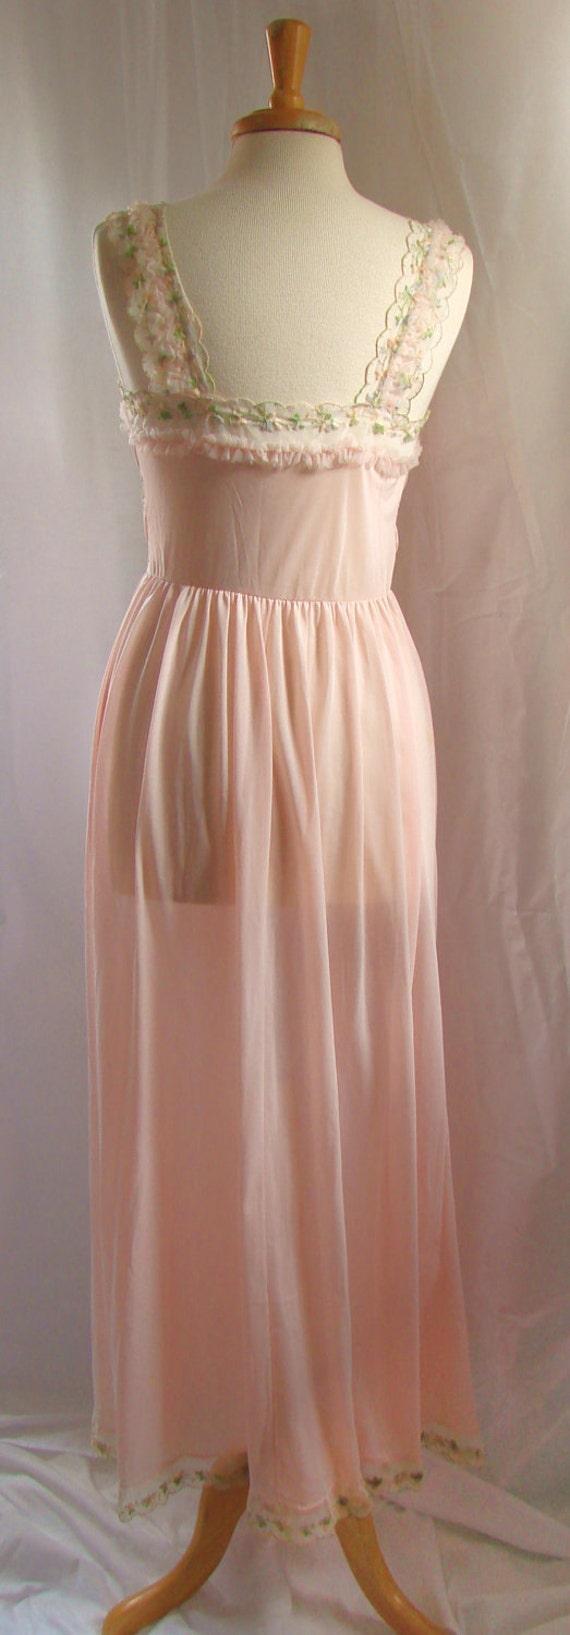 Blush Lingerie Nightgown / Vintage 50s Pink Peach Blush Gotham